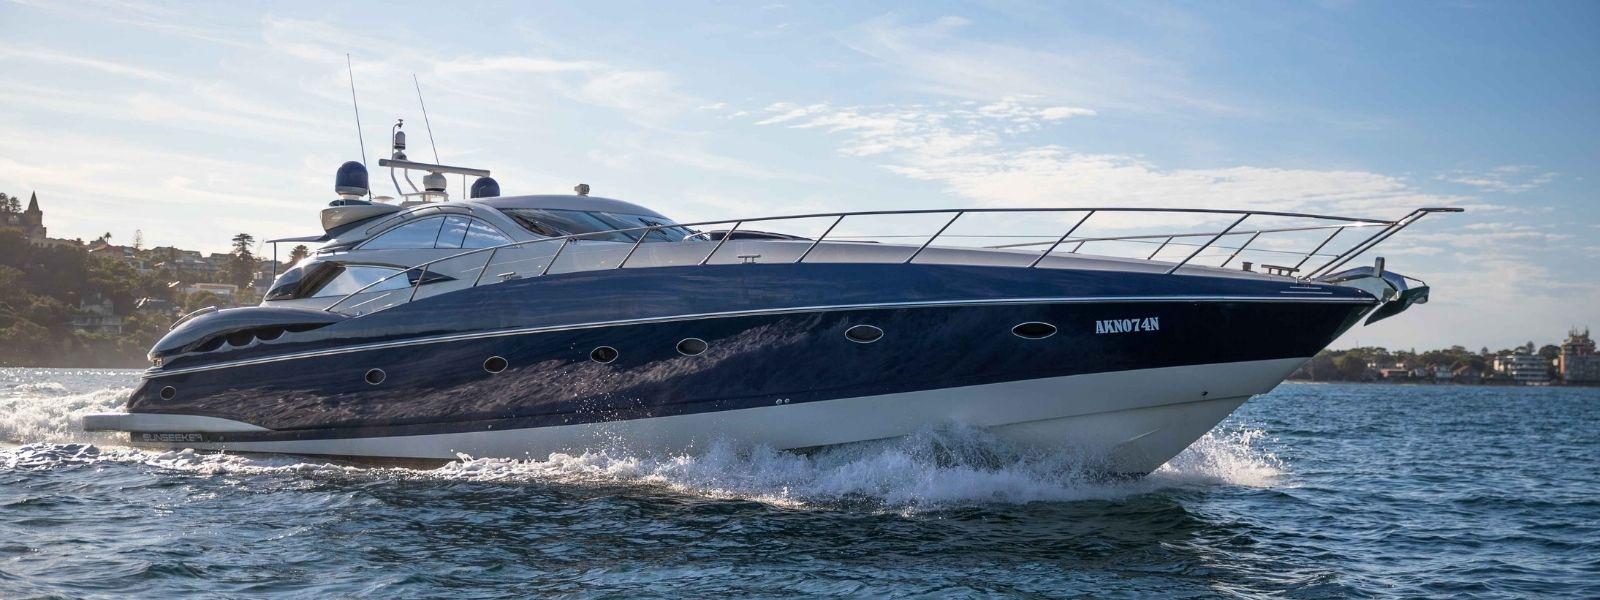 shot of MV Bruce cruising